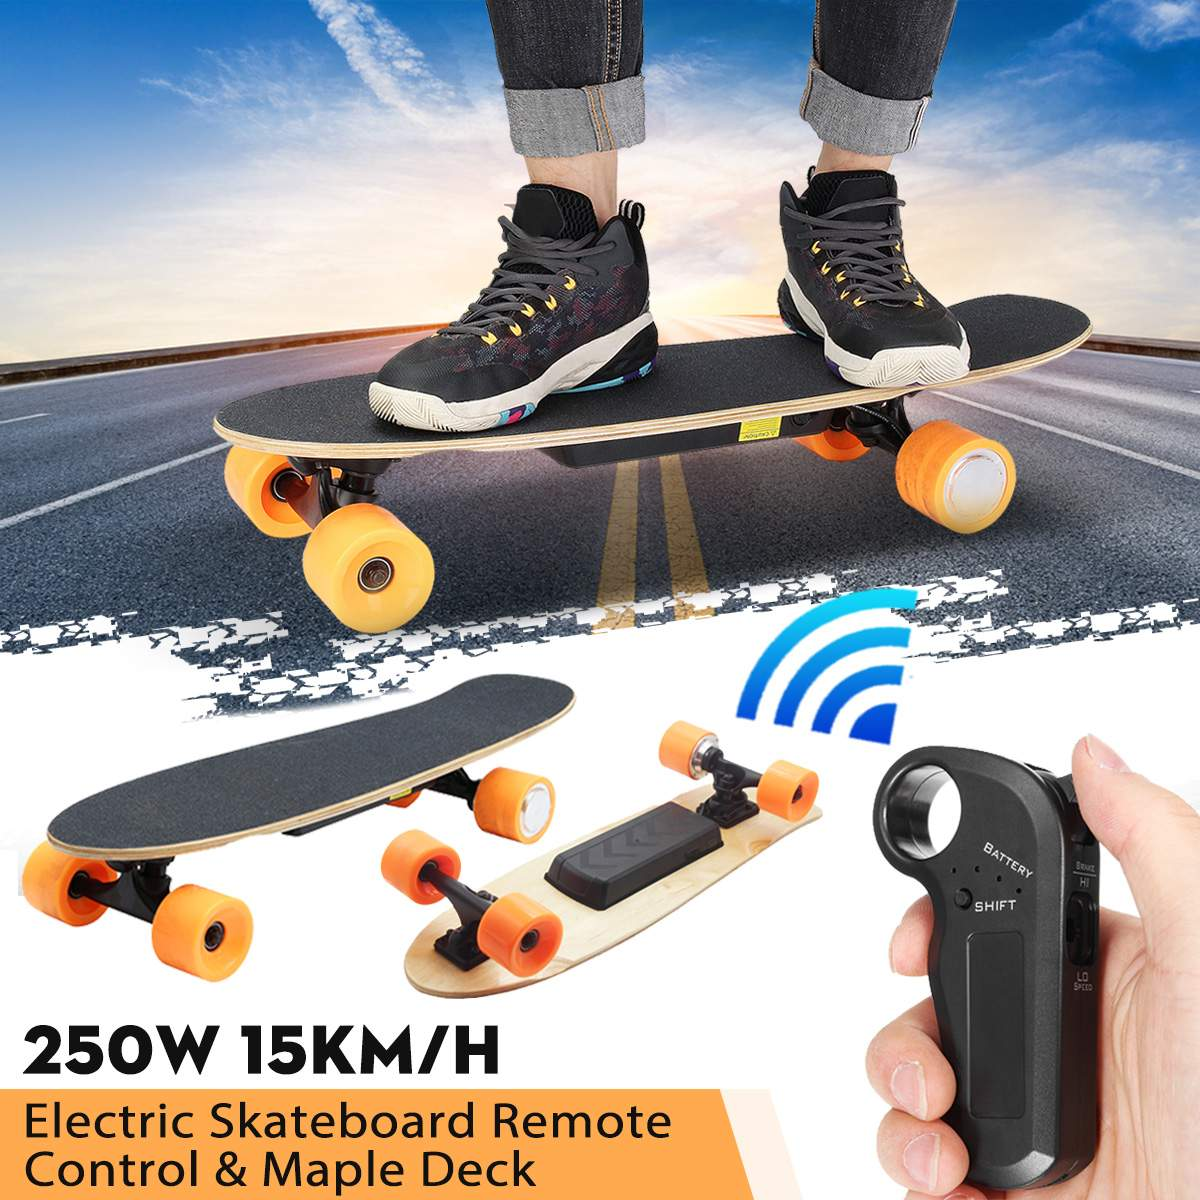 Electric Skateboard Four-wheel Longboard Skate Board Maple Deck Wireless  Remote Controll Skateboard Wheels For ac0a0981bdf14